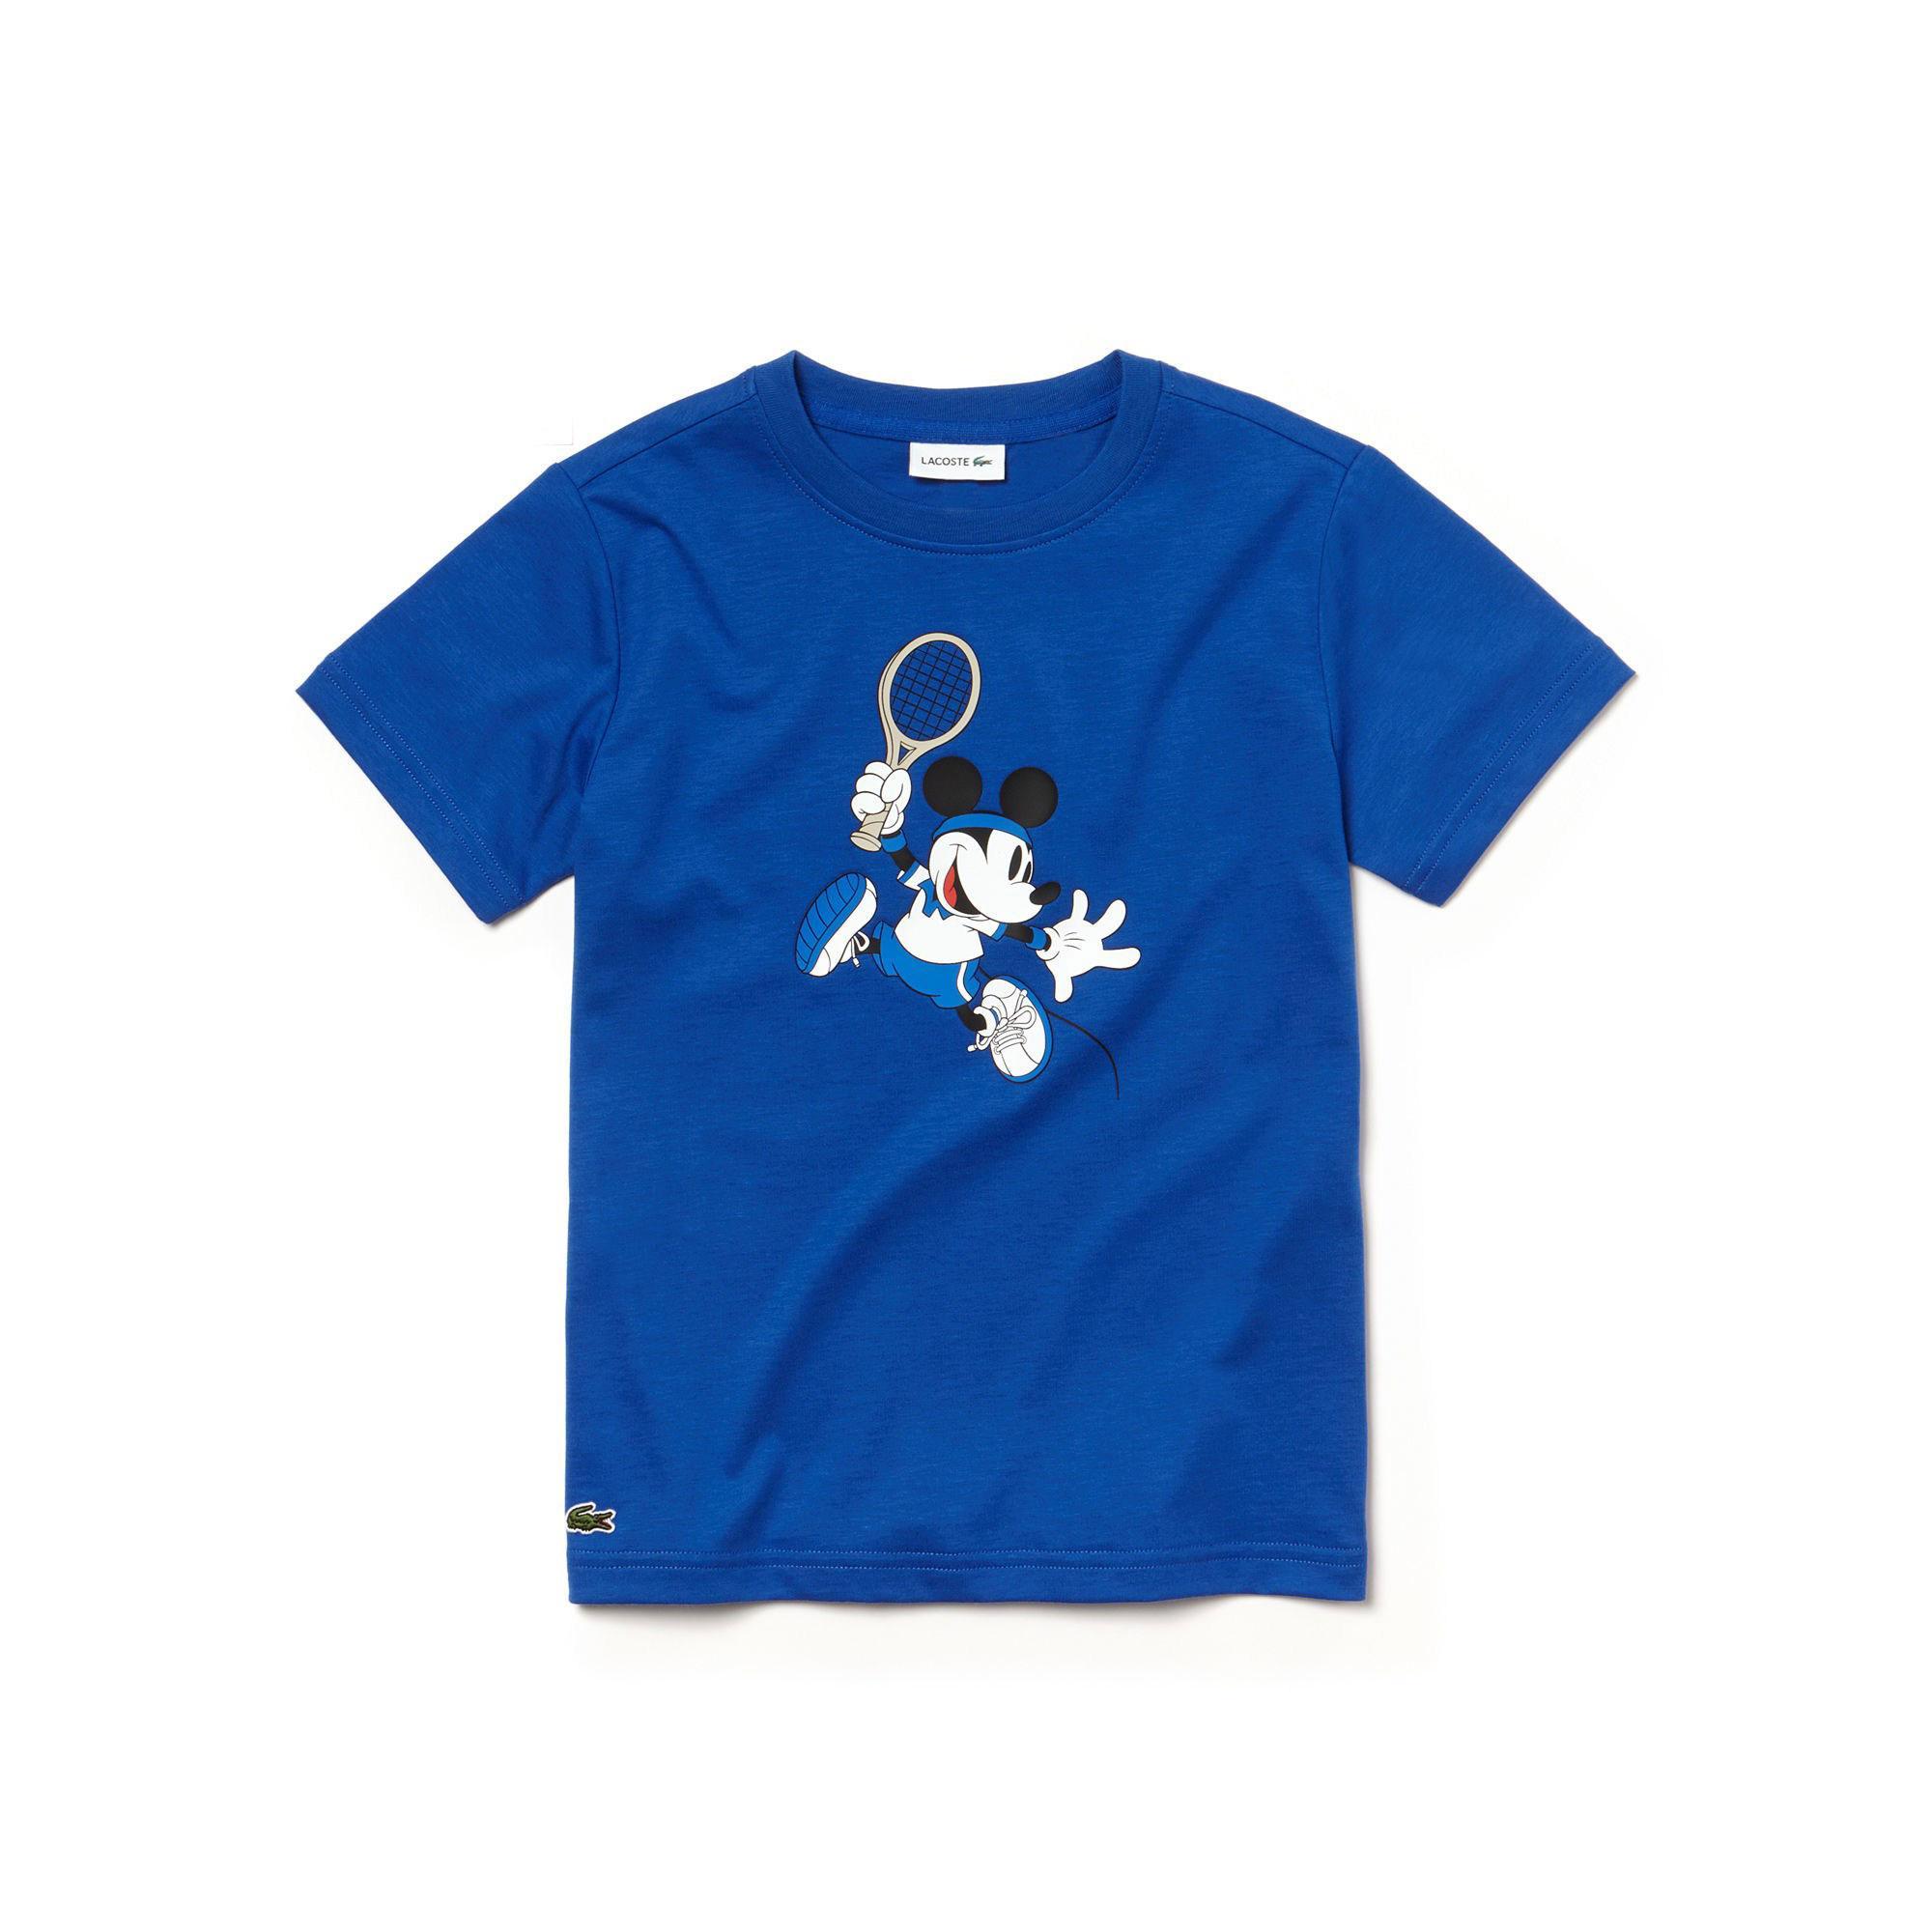 Lacoste Çocuk Saks T-Shirt